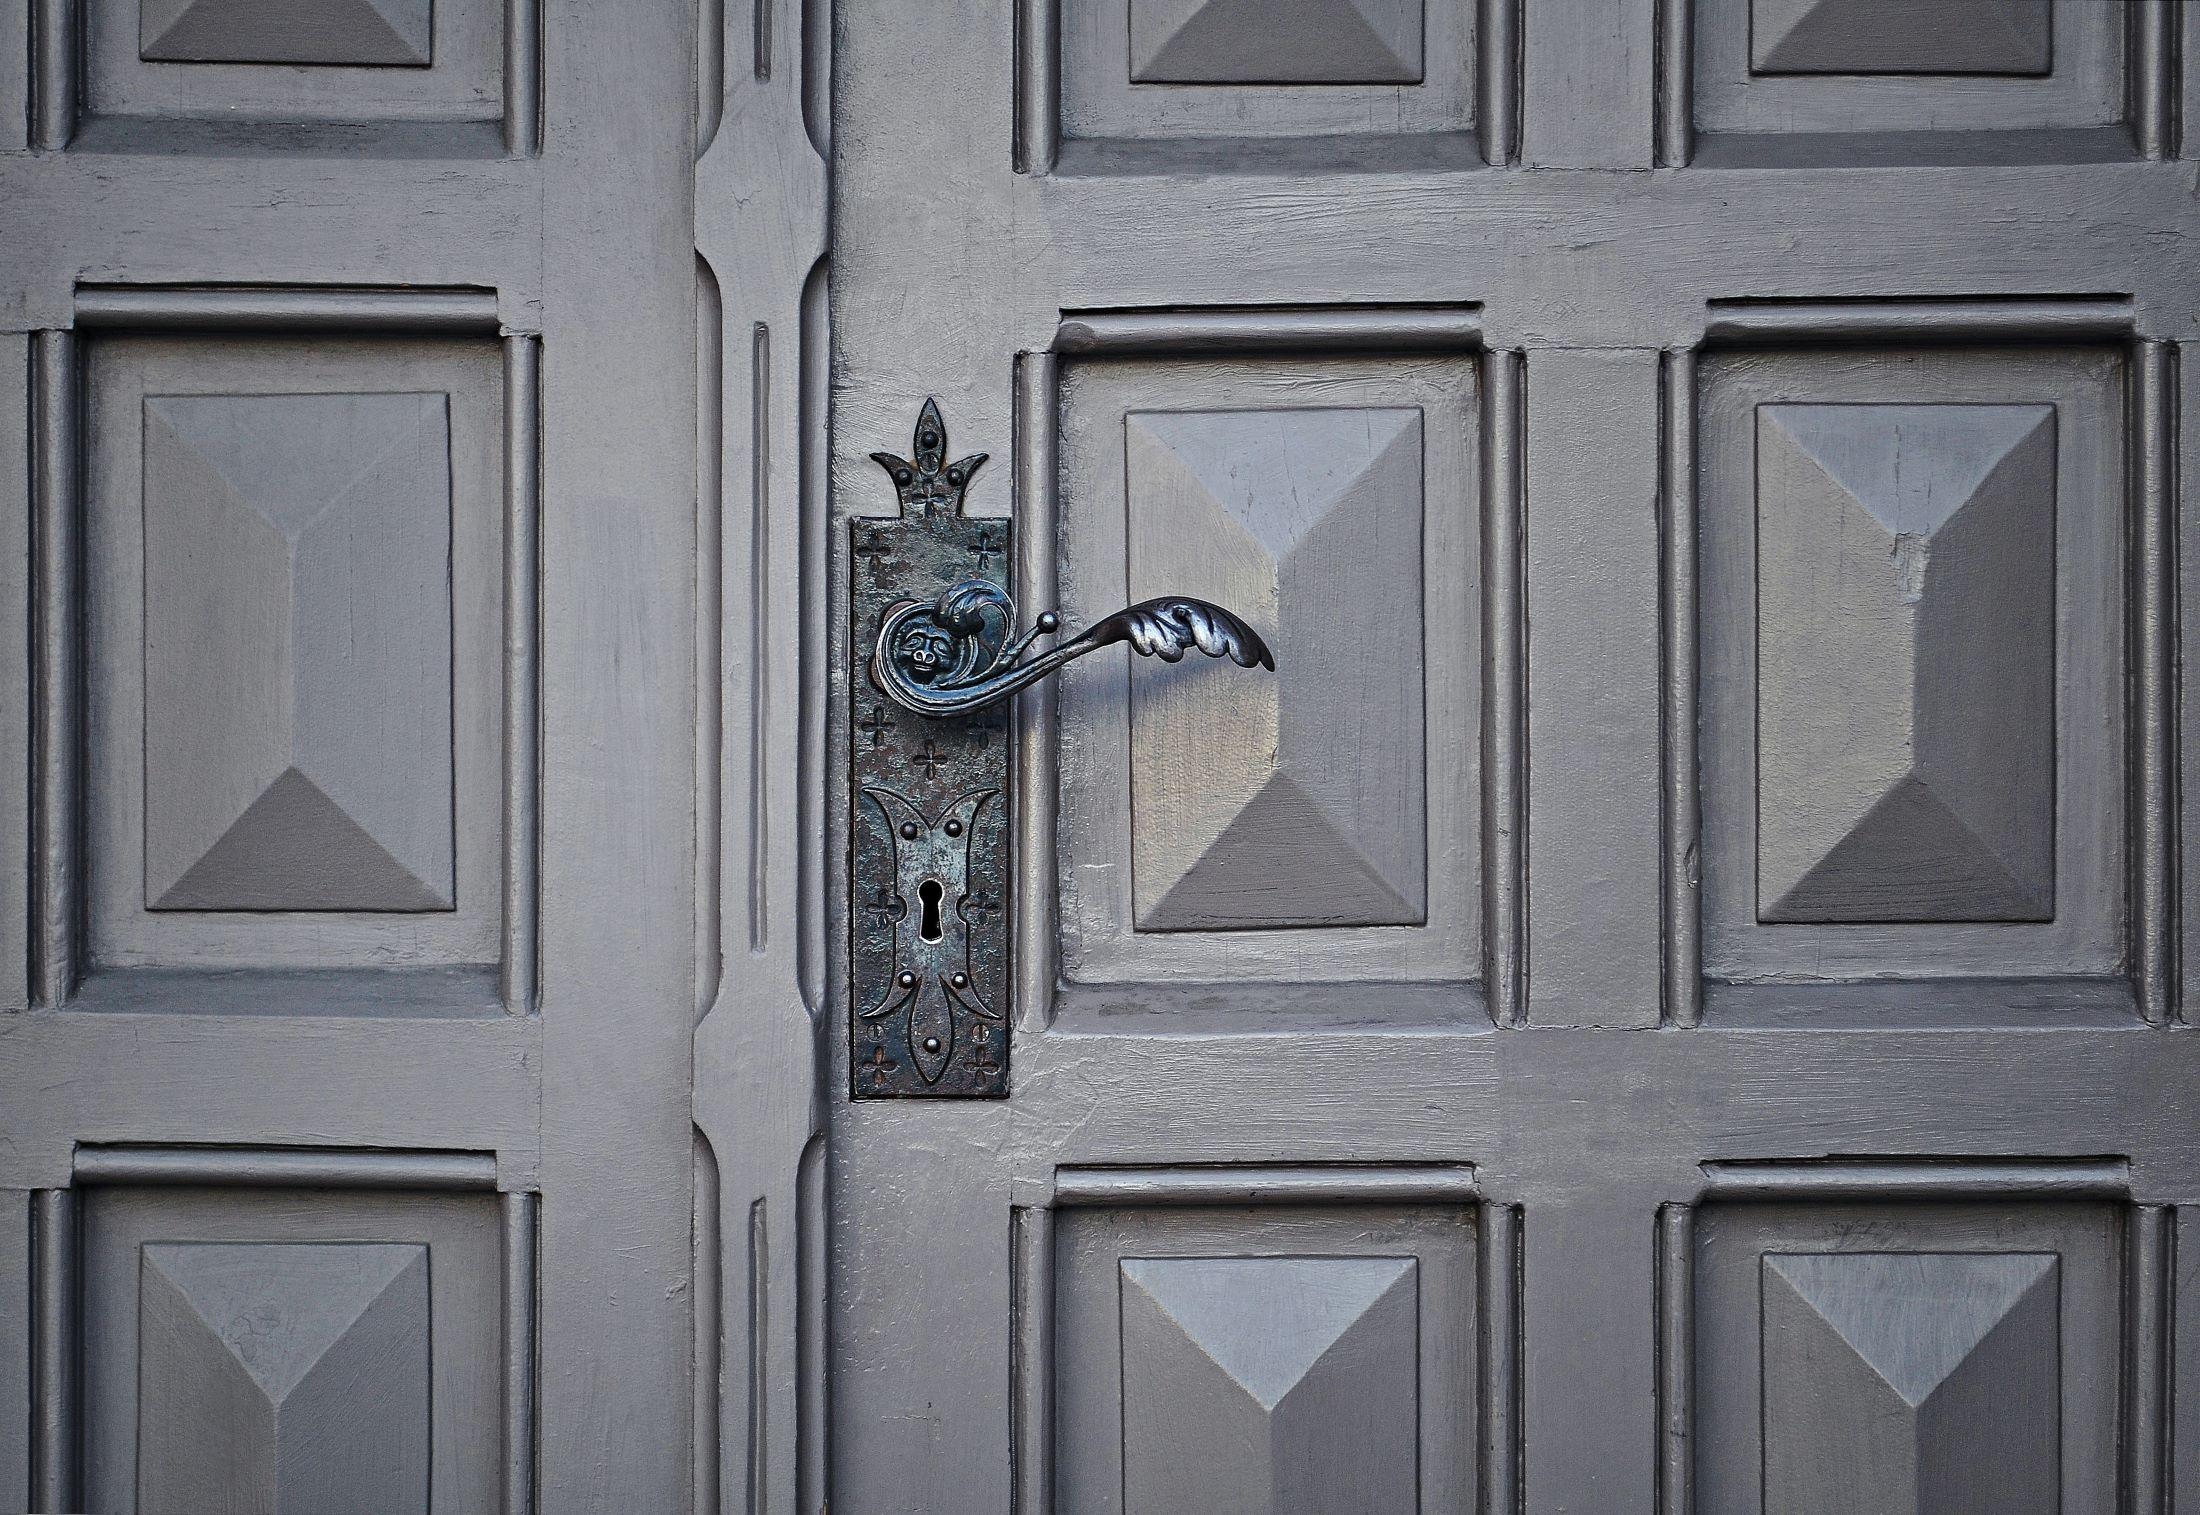 Door Lock - Home Security - CCTV - AC Locksmith Brisbane - New Key And Barrel Installation - AC Locksmith Brisbane's Van - AC Locksmiths Brisbane, Best Rated Locksmith Brisbane, Emergency Locksmith Brisbane, Locksmith Brisbane. Locksmith Near Me.